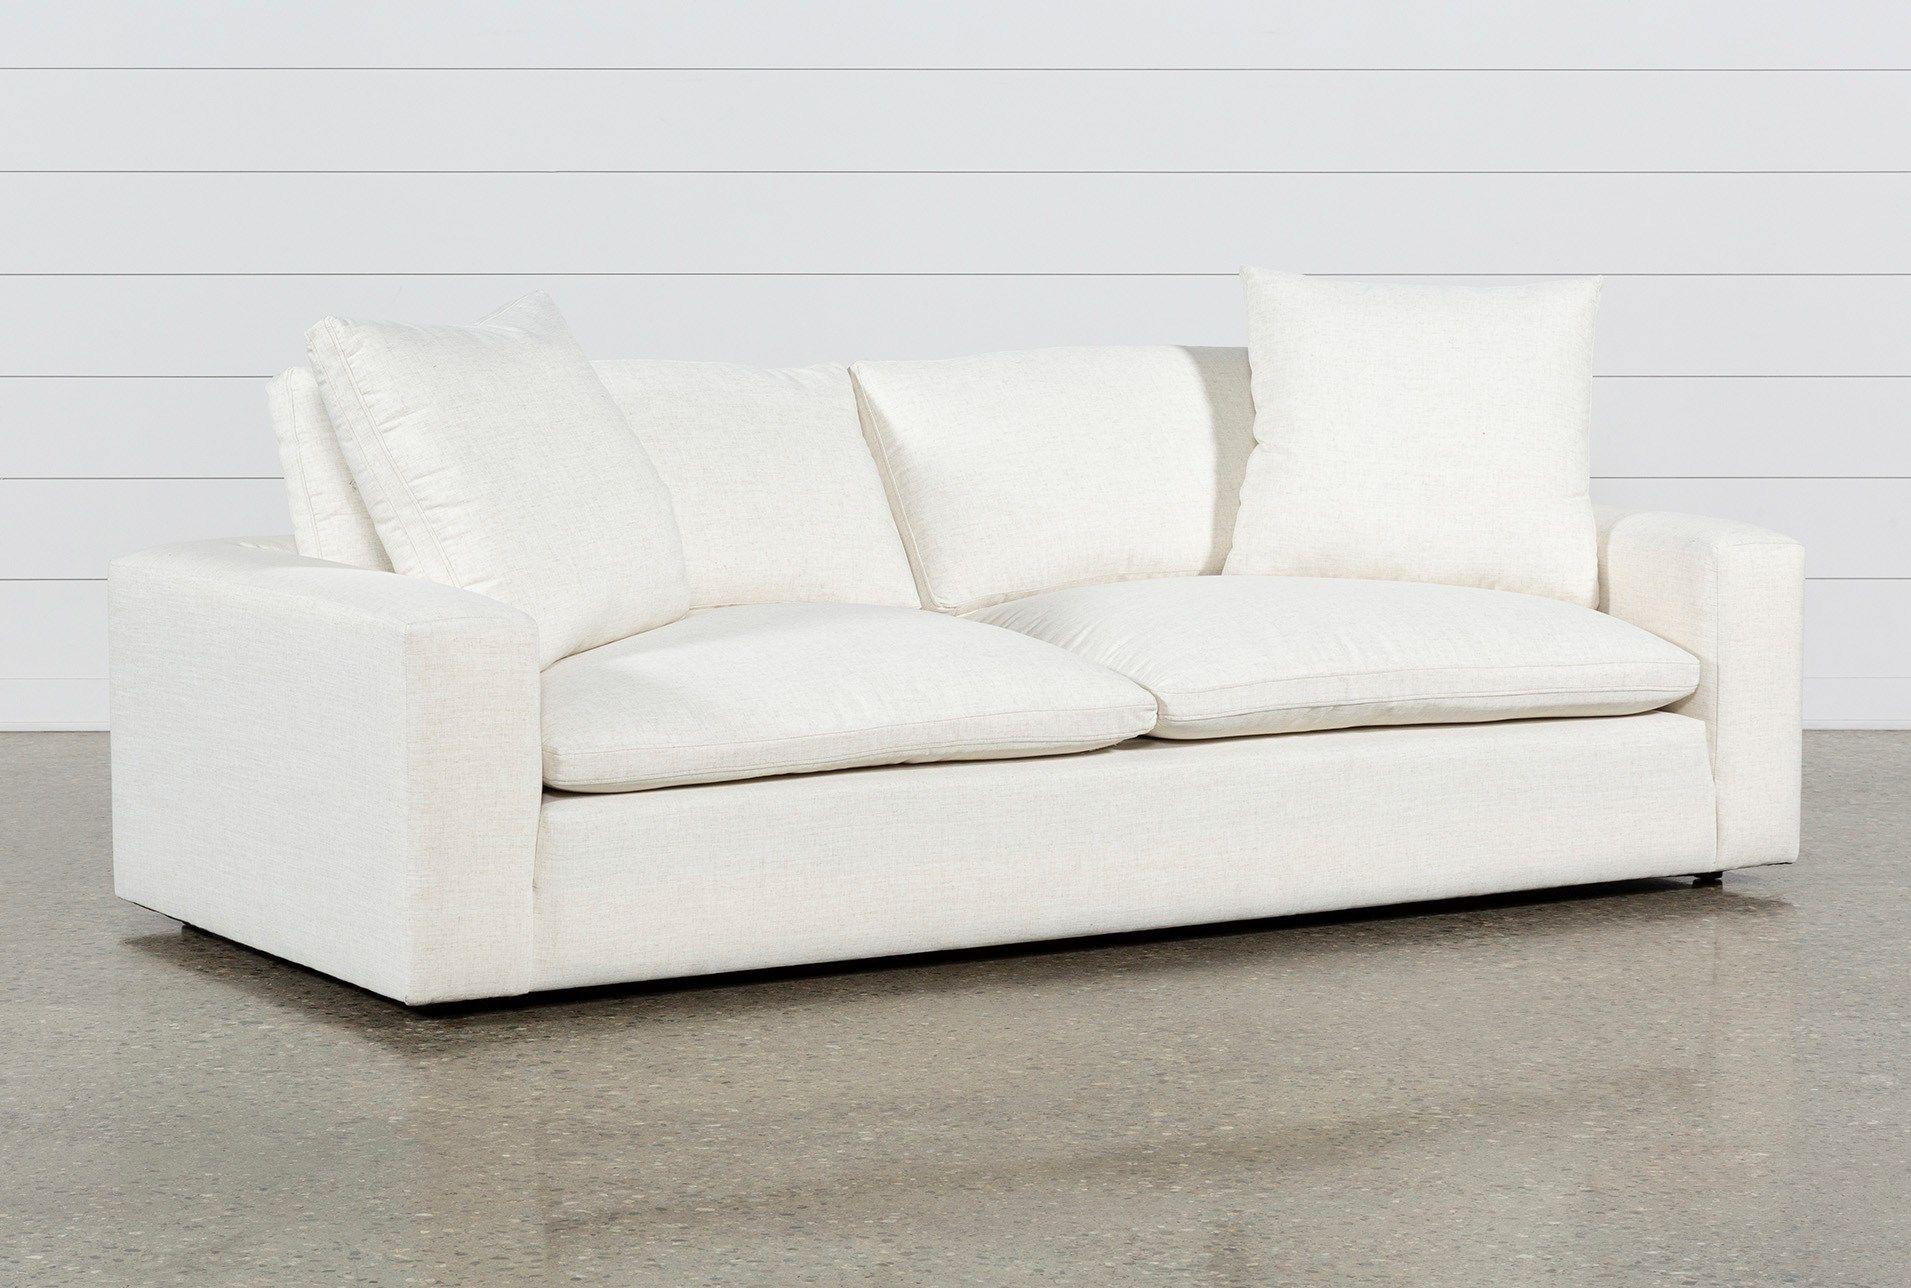 Utopia Sofa White Sofa Bed Deep Couch Sofa